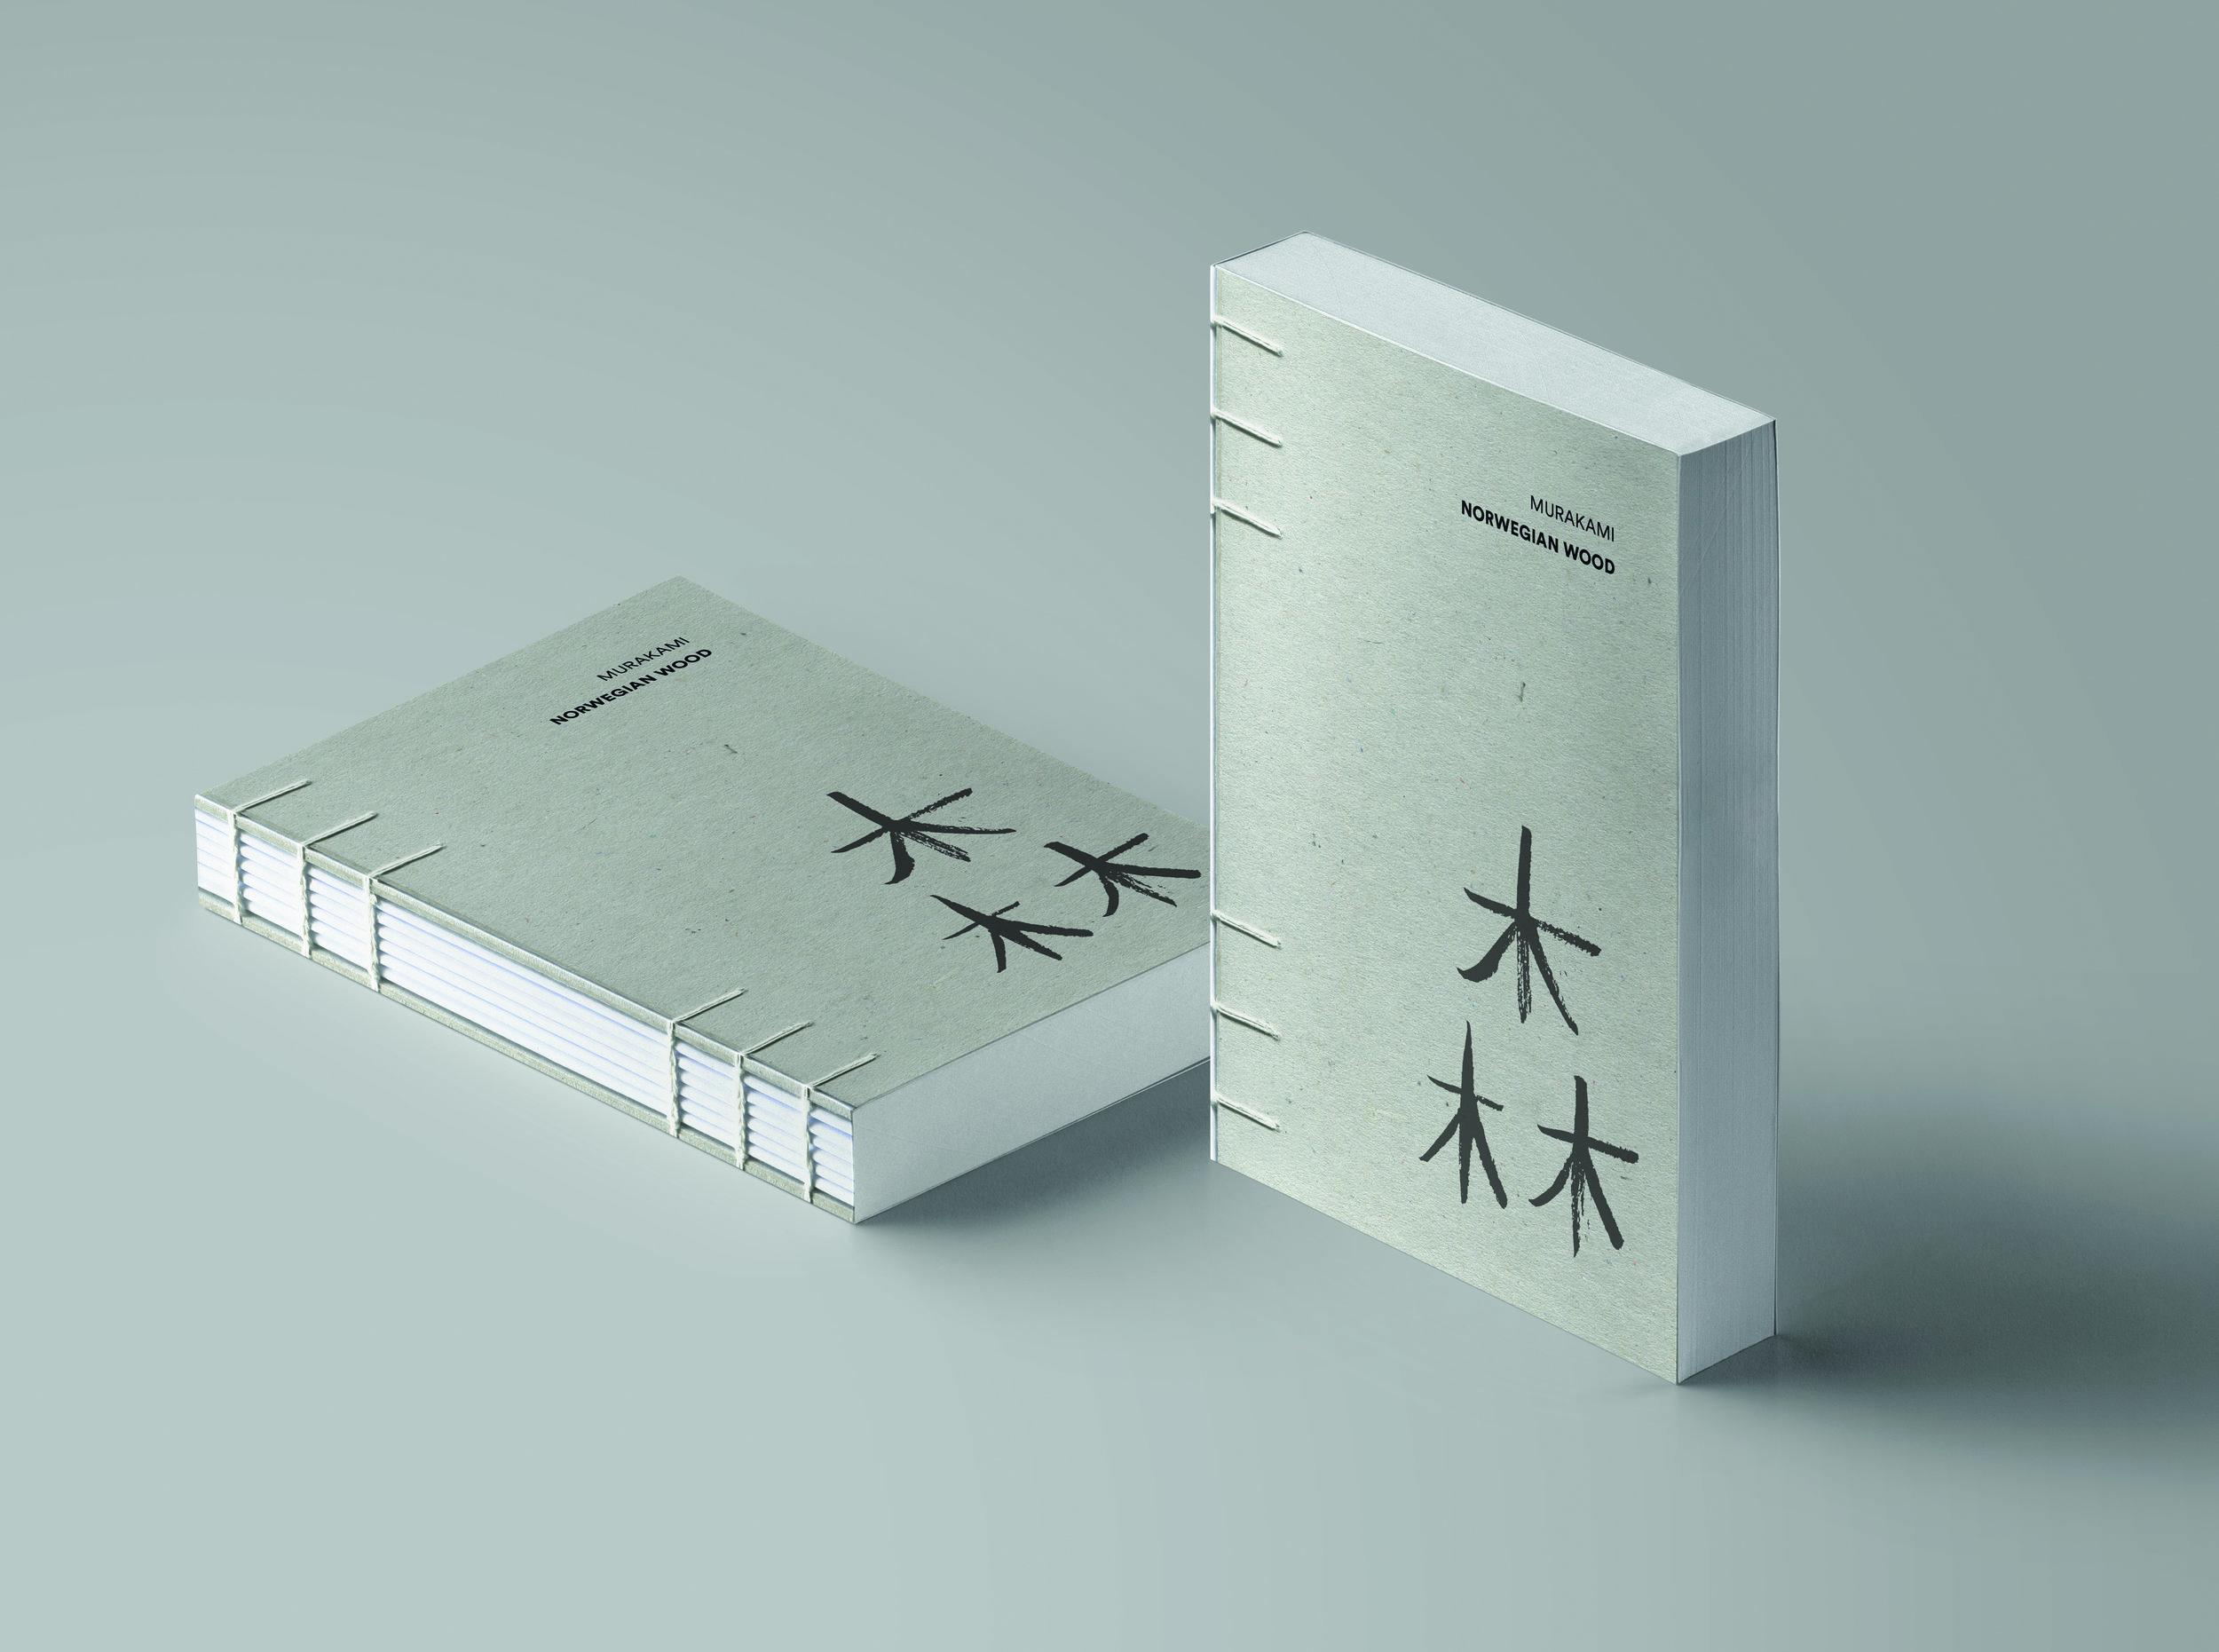 norwegian-wood-cover.jpg